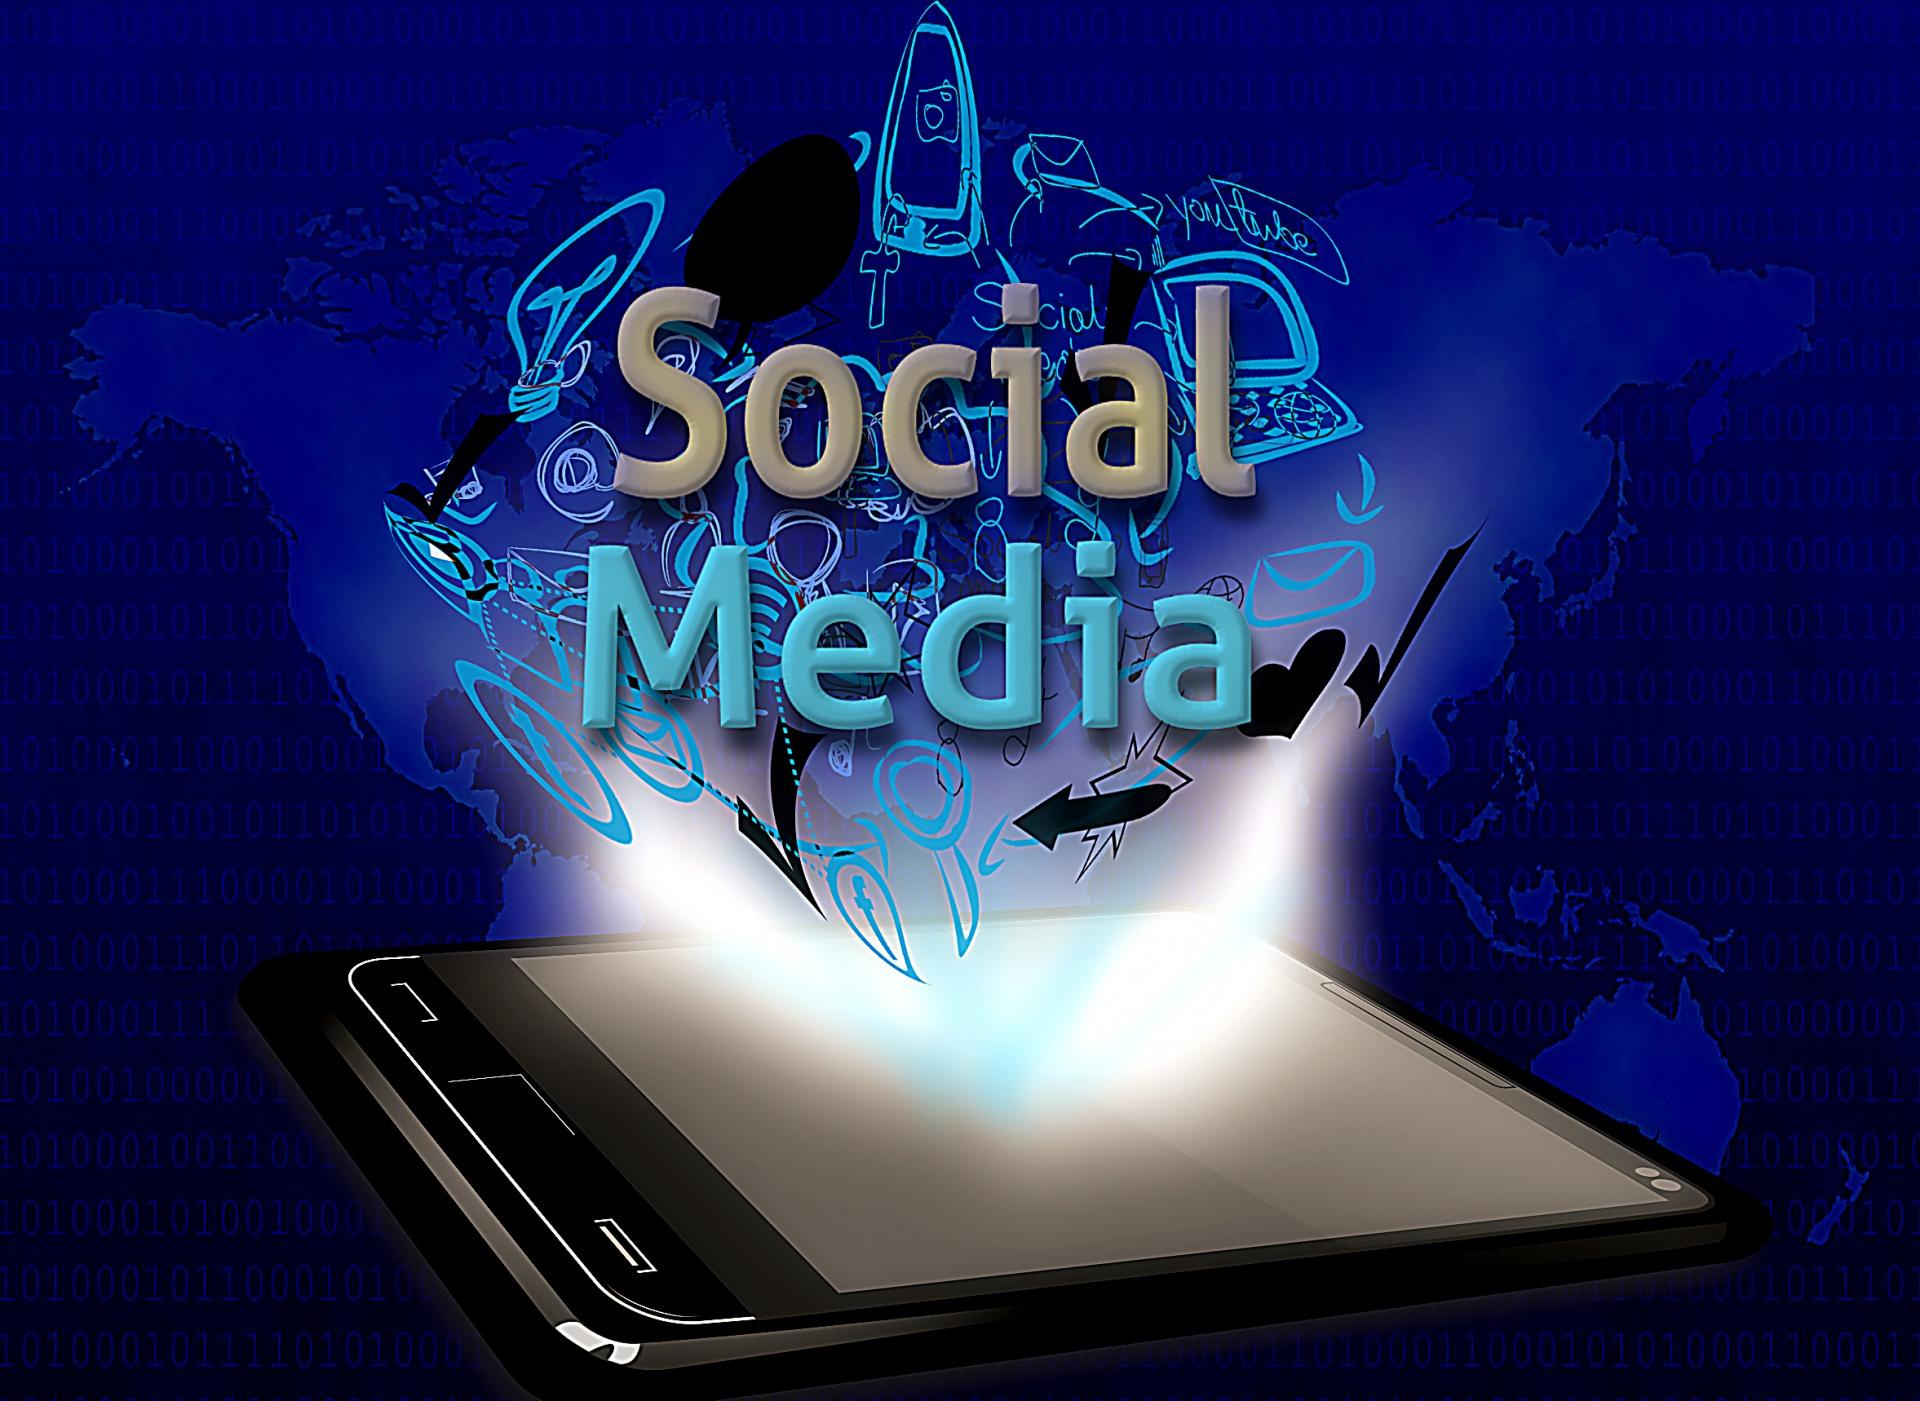 Social,media,network,mobile,social network - free image from needpix.com